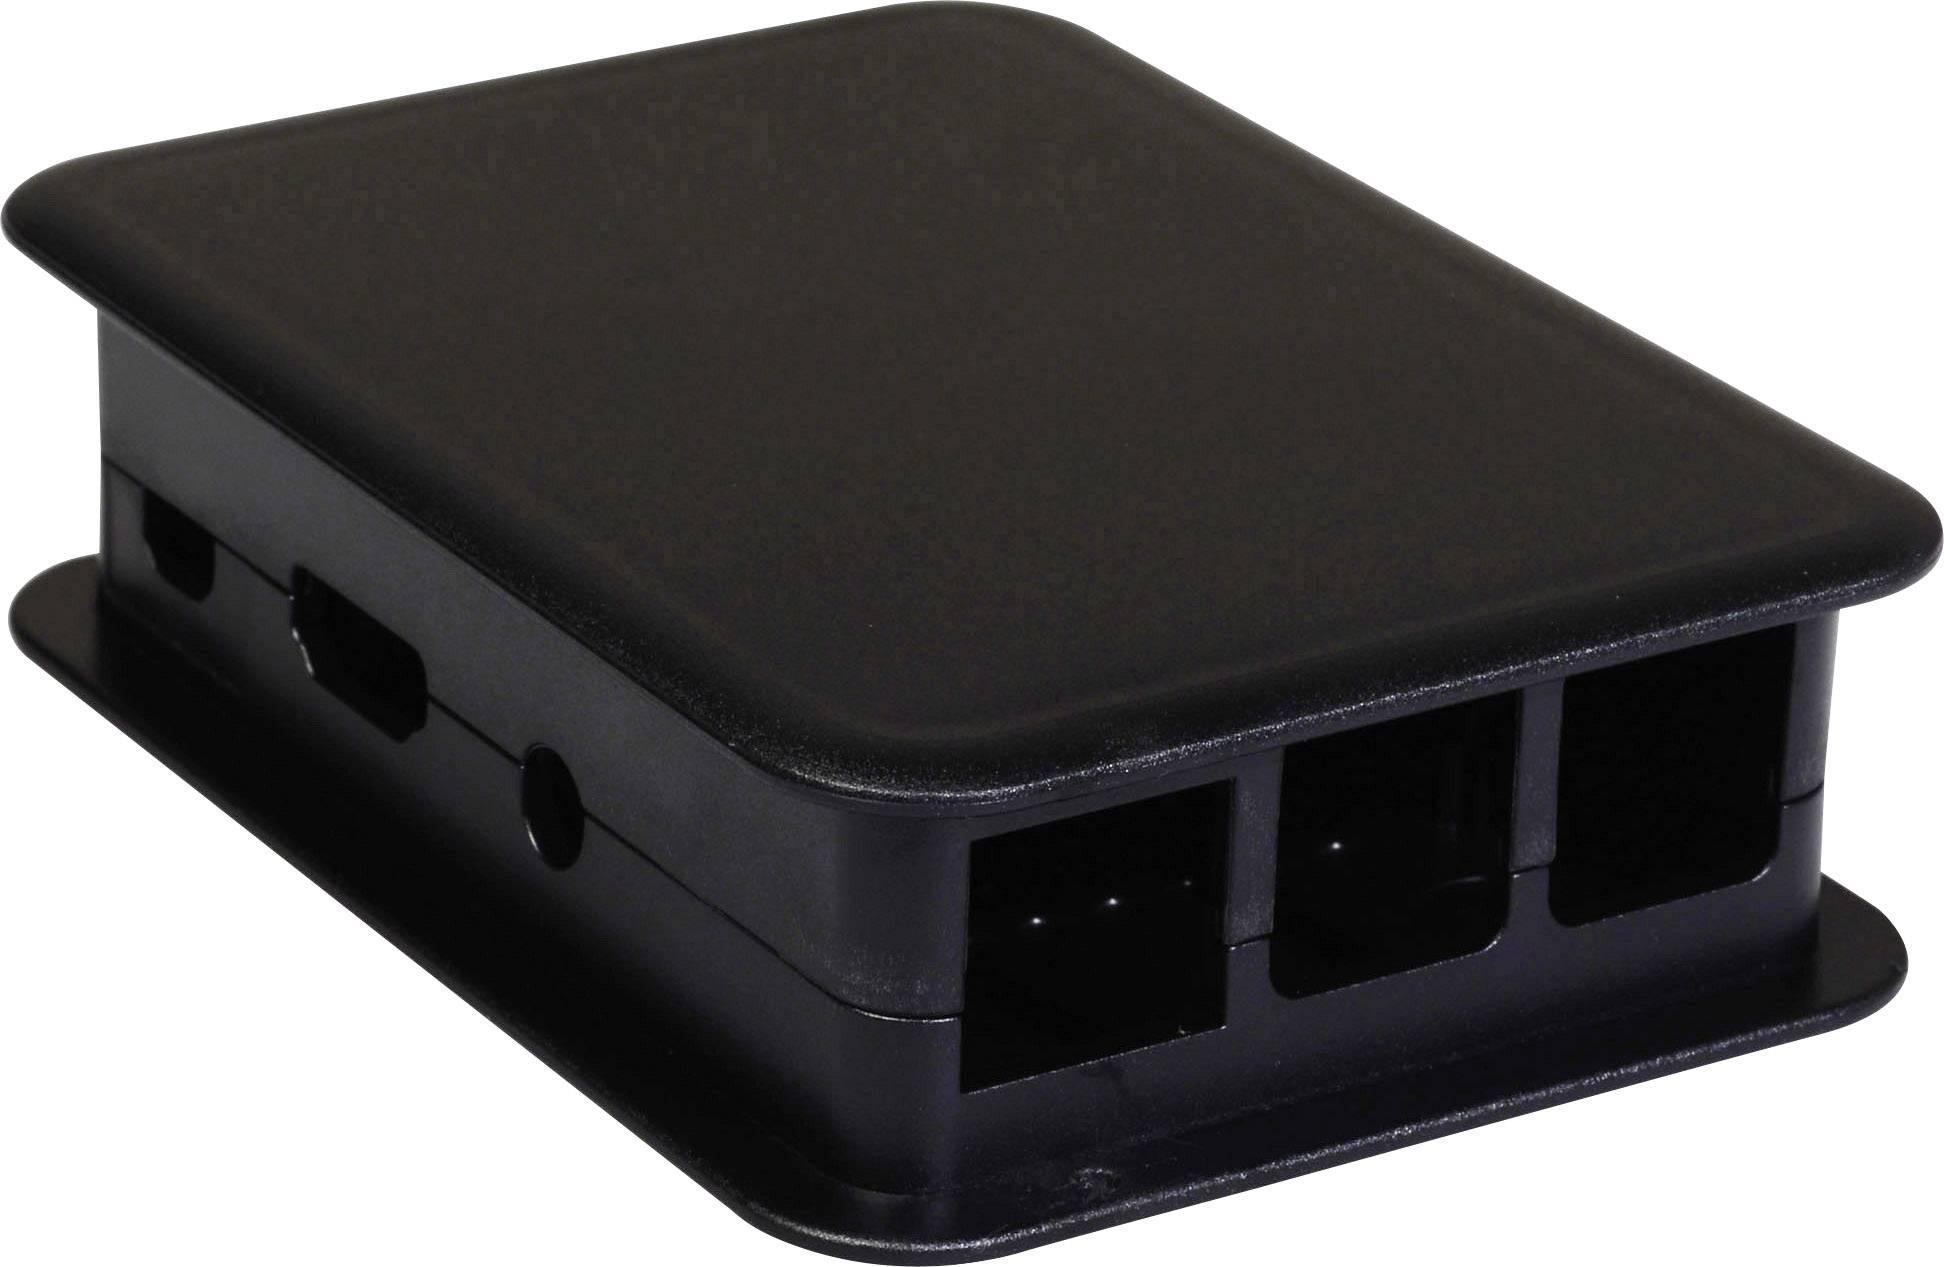 Kryt Raspberry Pi B++ TEKO TEK-BERRY3.9, pro Raspberry Pi® B+, černá